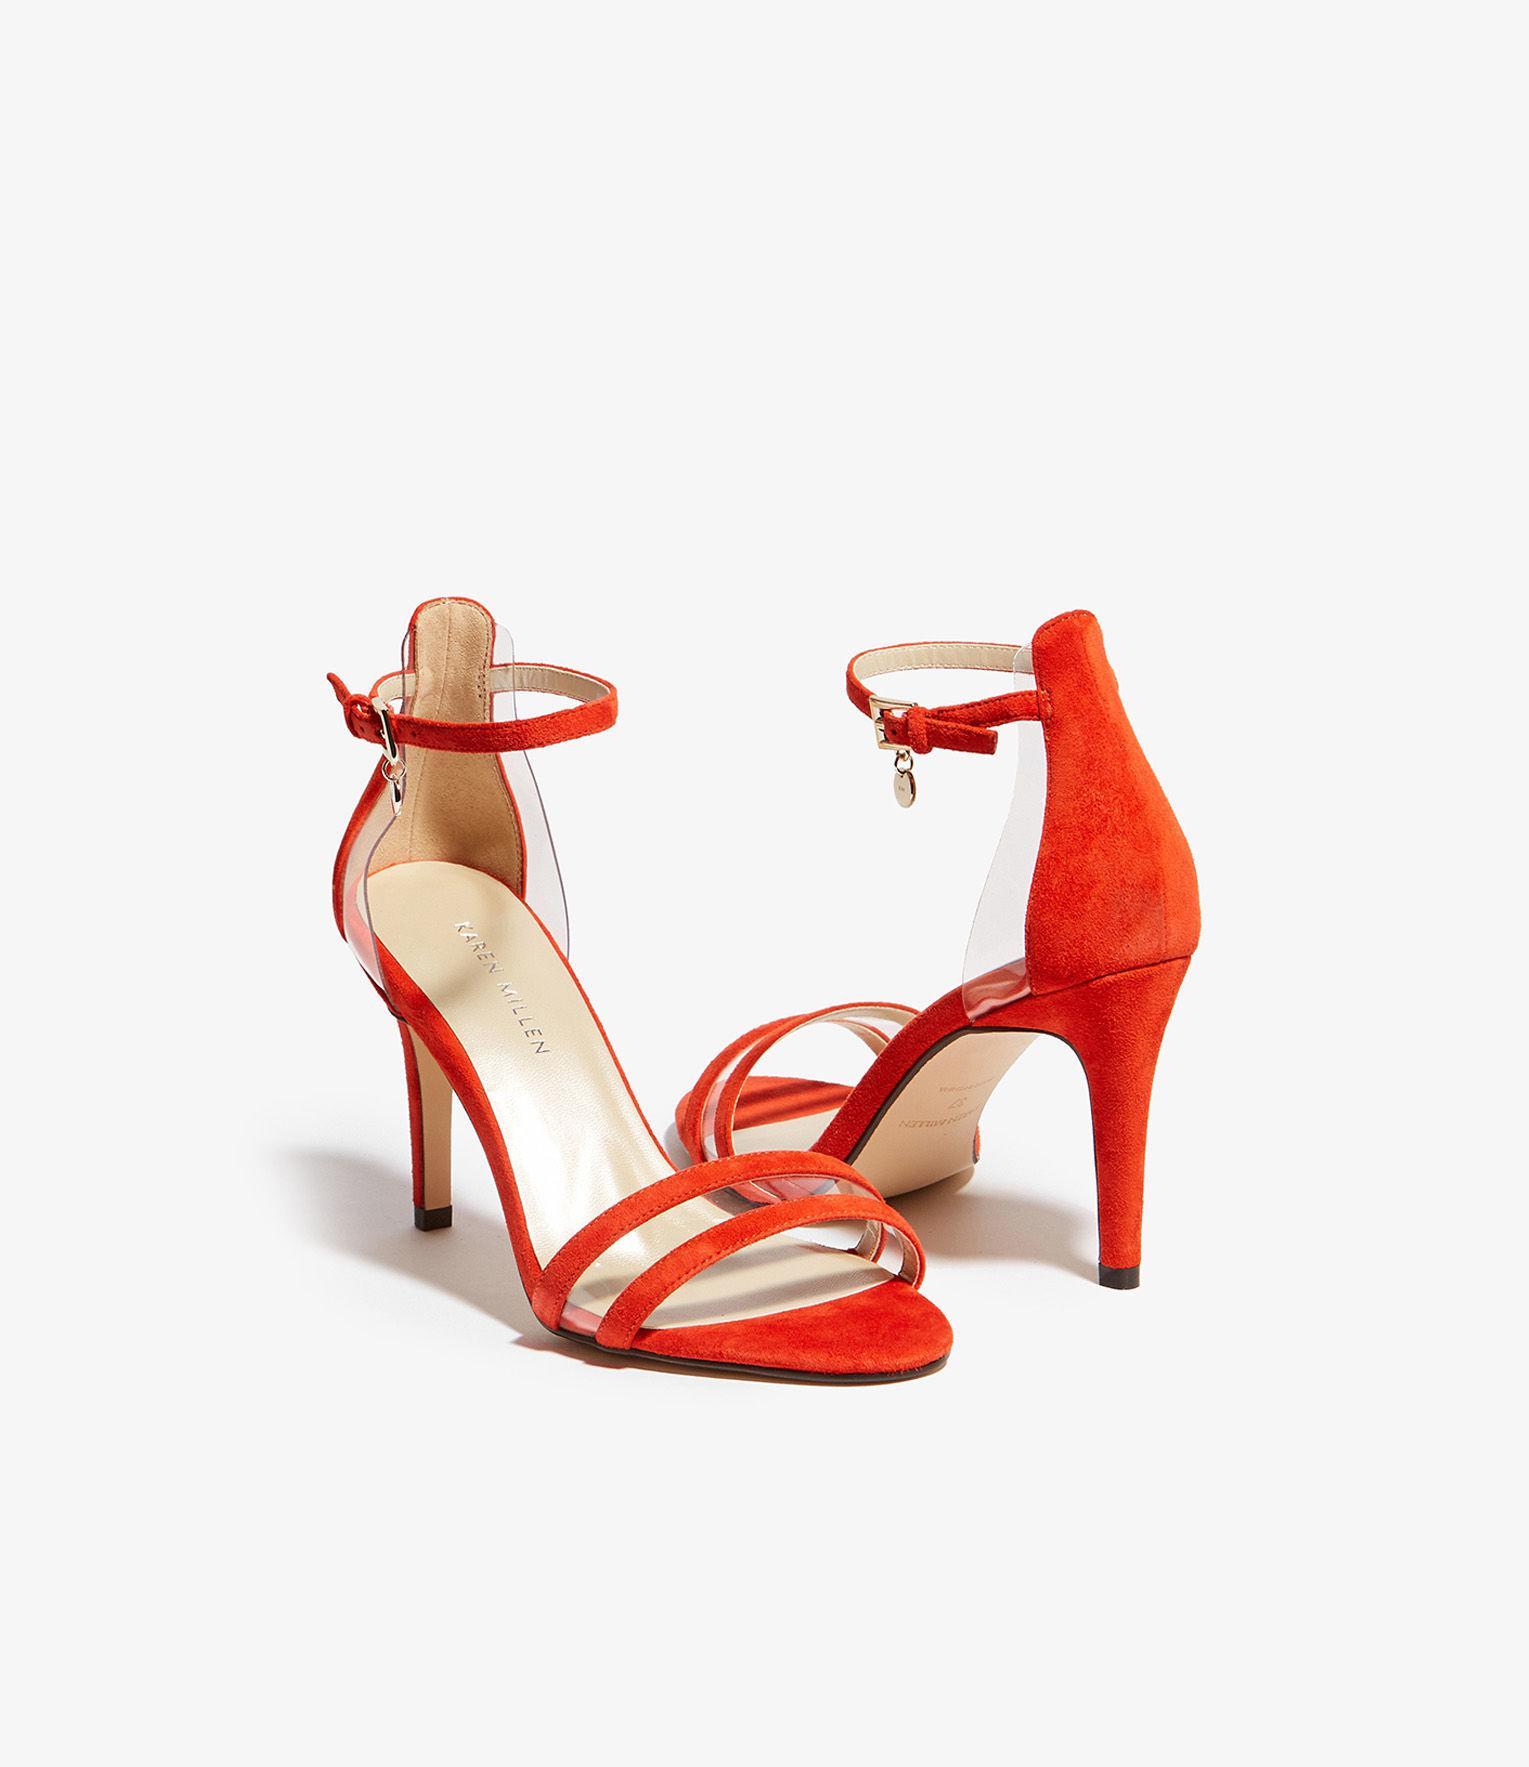 0e764c0ea3c Karen Millen - Orange Suede Heeled Sandals - Lyst. View fullscreen